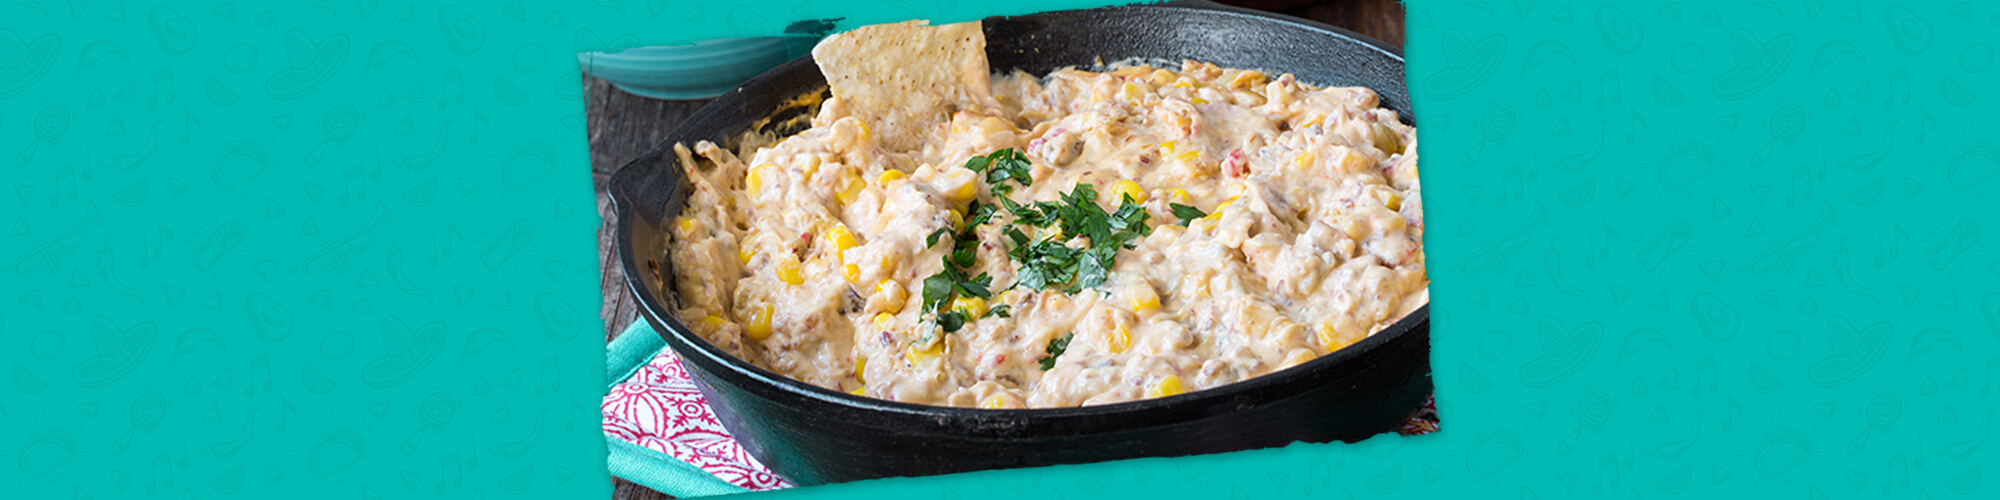 Salsas creamy corn and bacon quesadilla